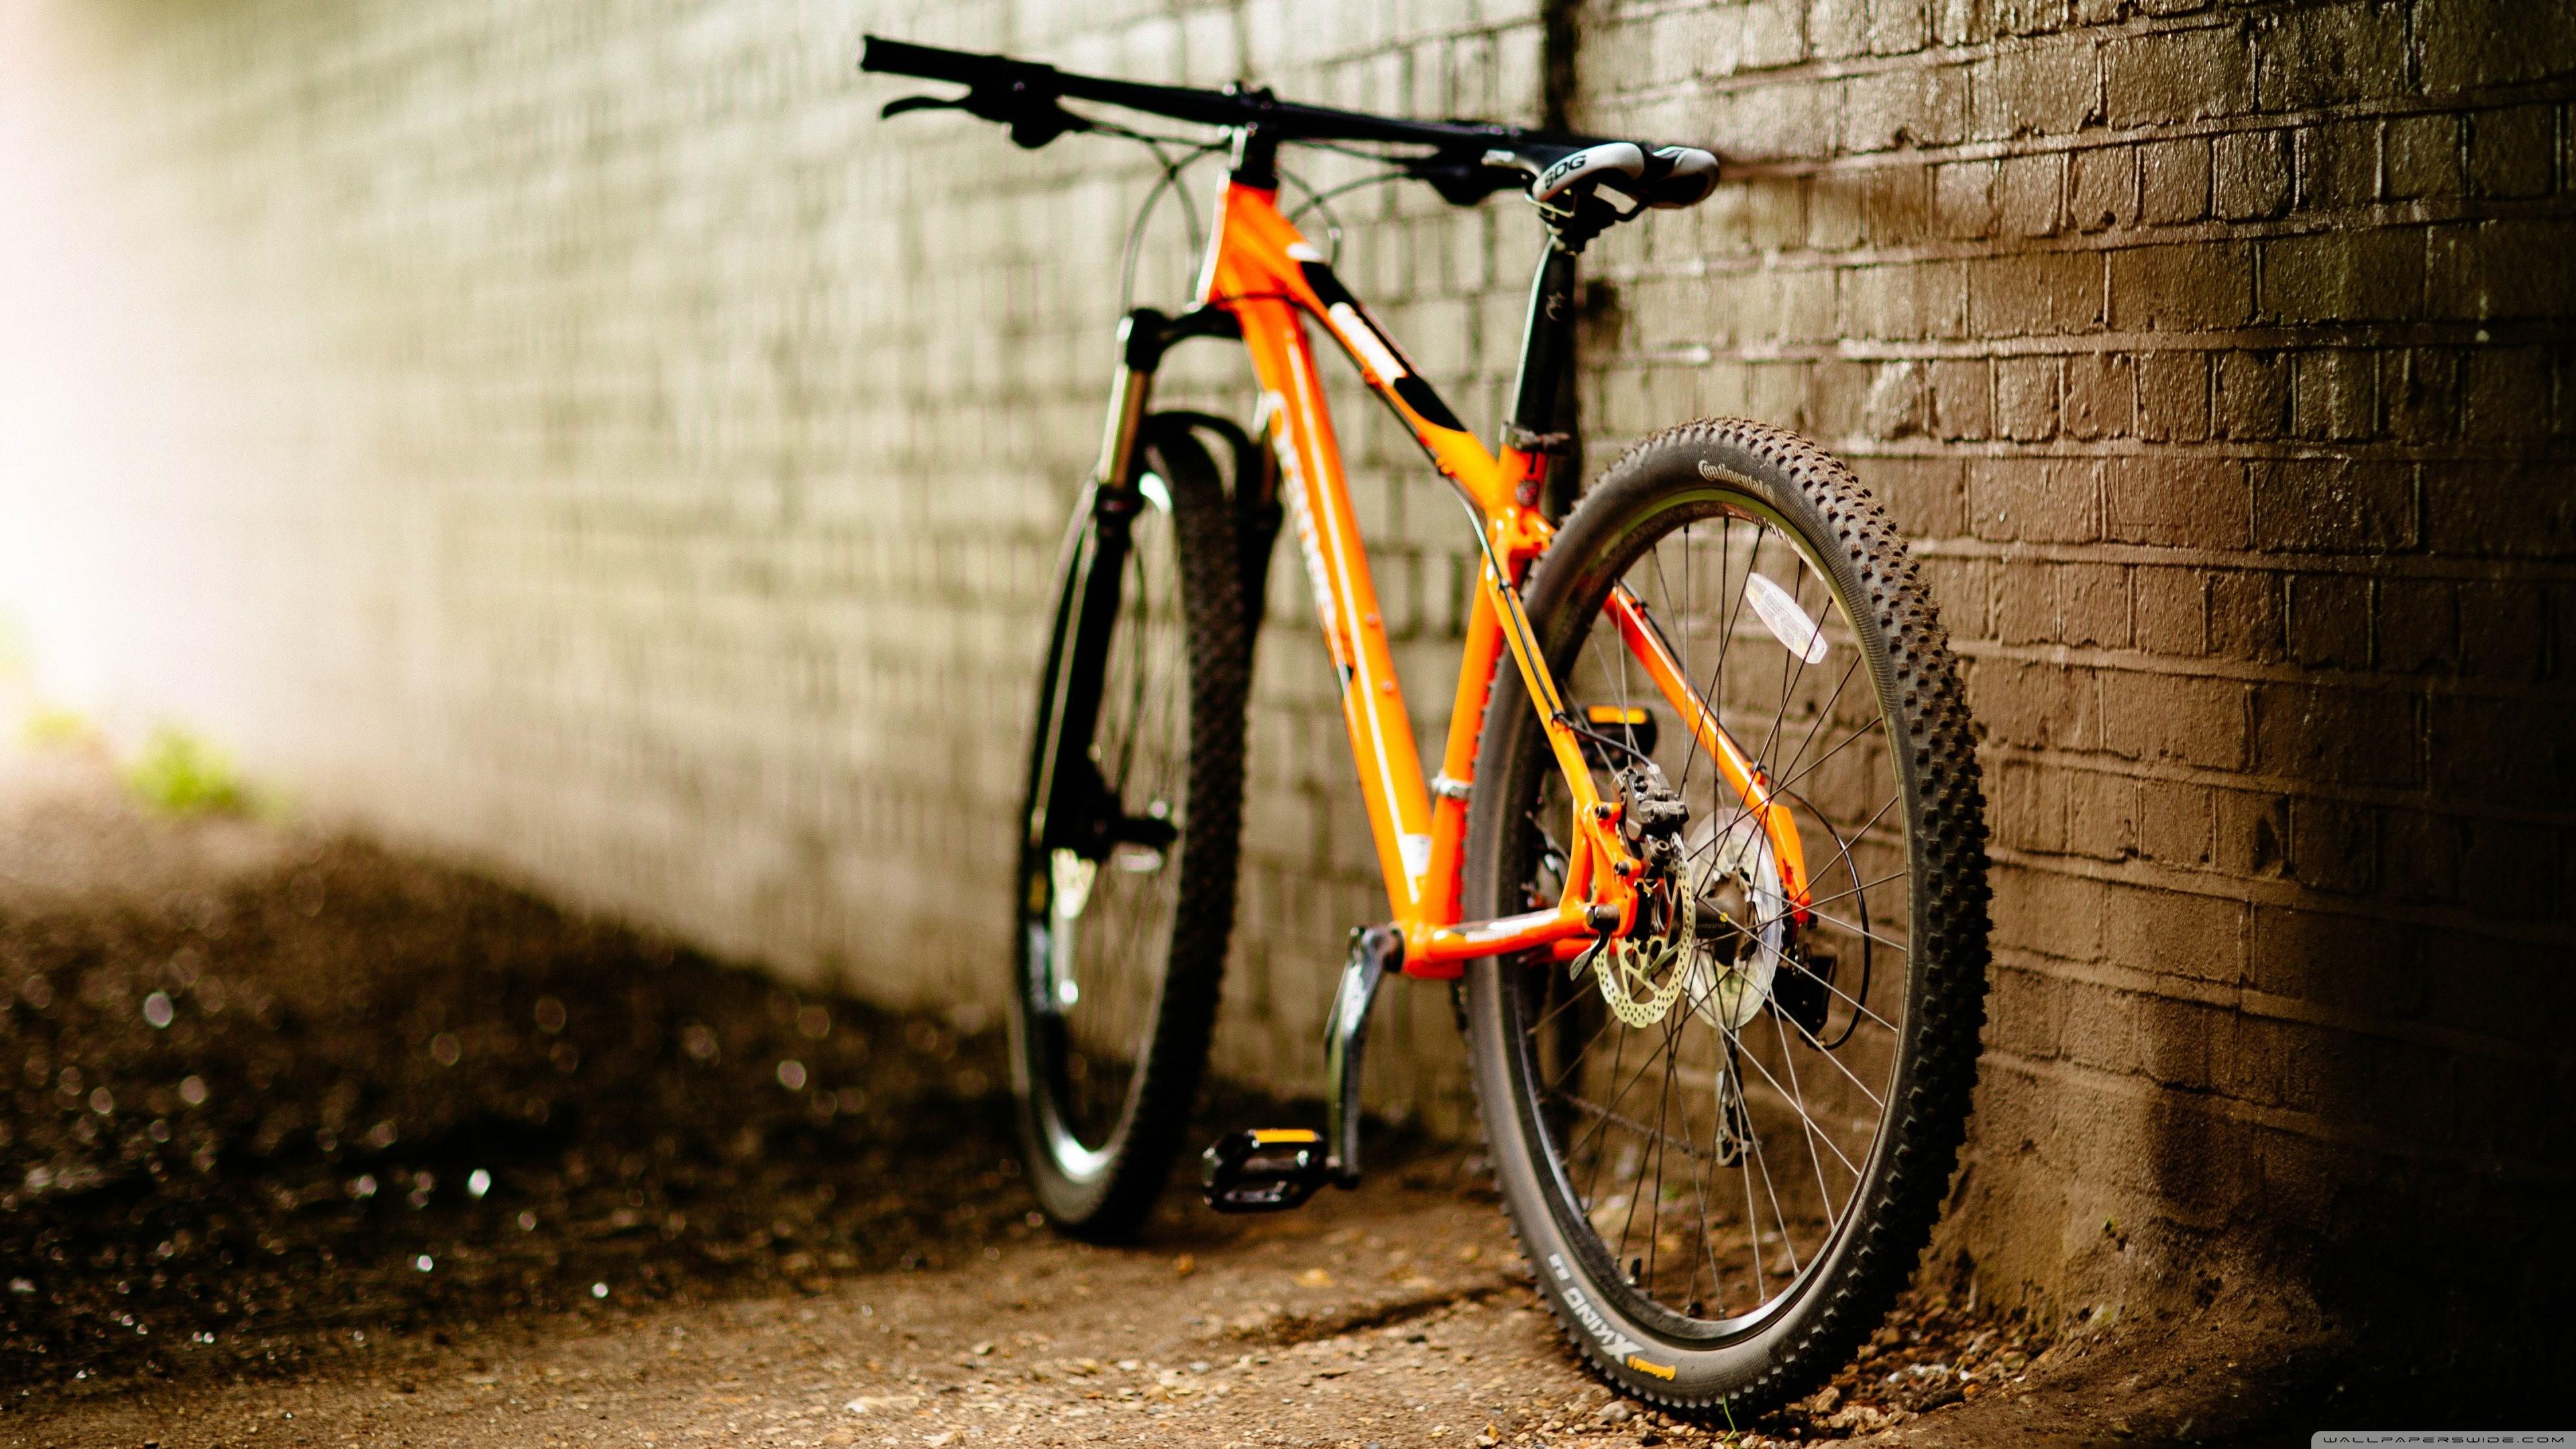 Bike Stunt Hd Wallpapers This Wallpaper Data Src Cycle Wallpaper Hd 3840x2160 Download Hd Wallpaper Wallpapertip